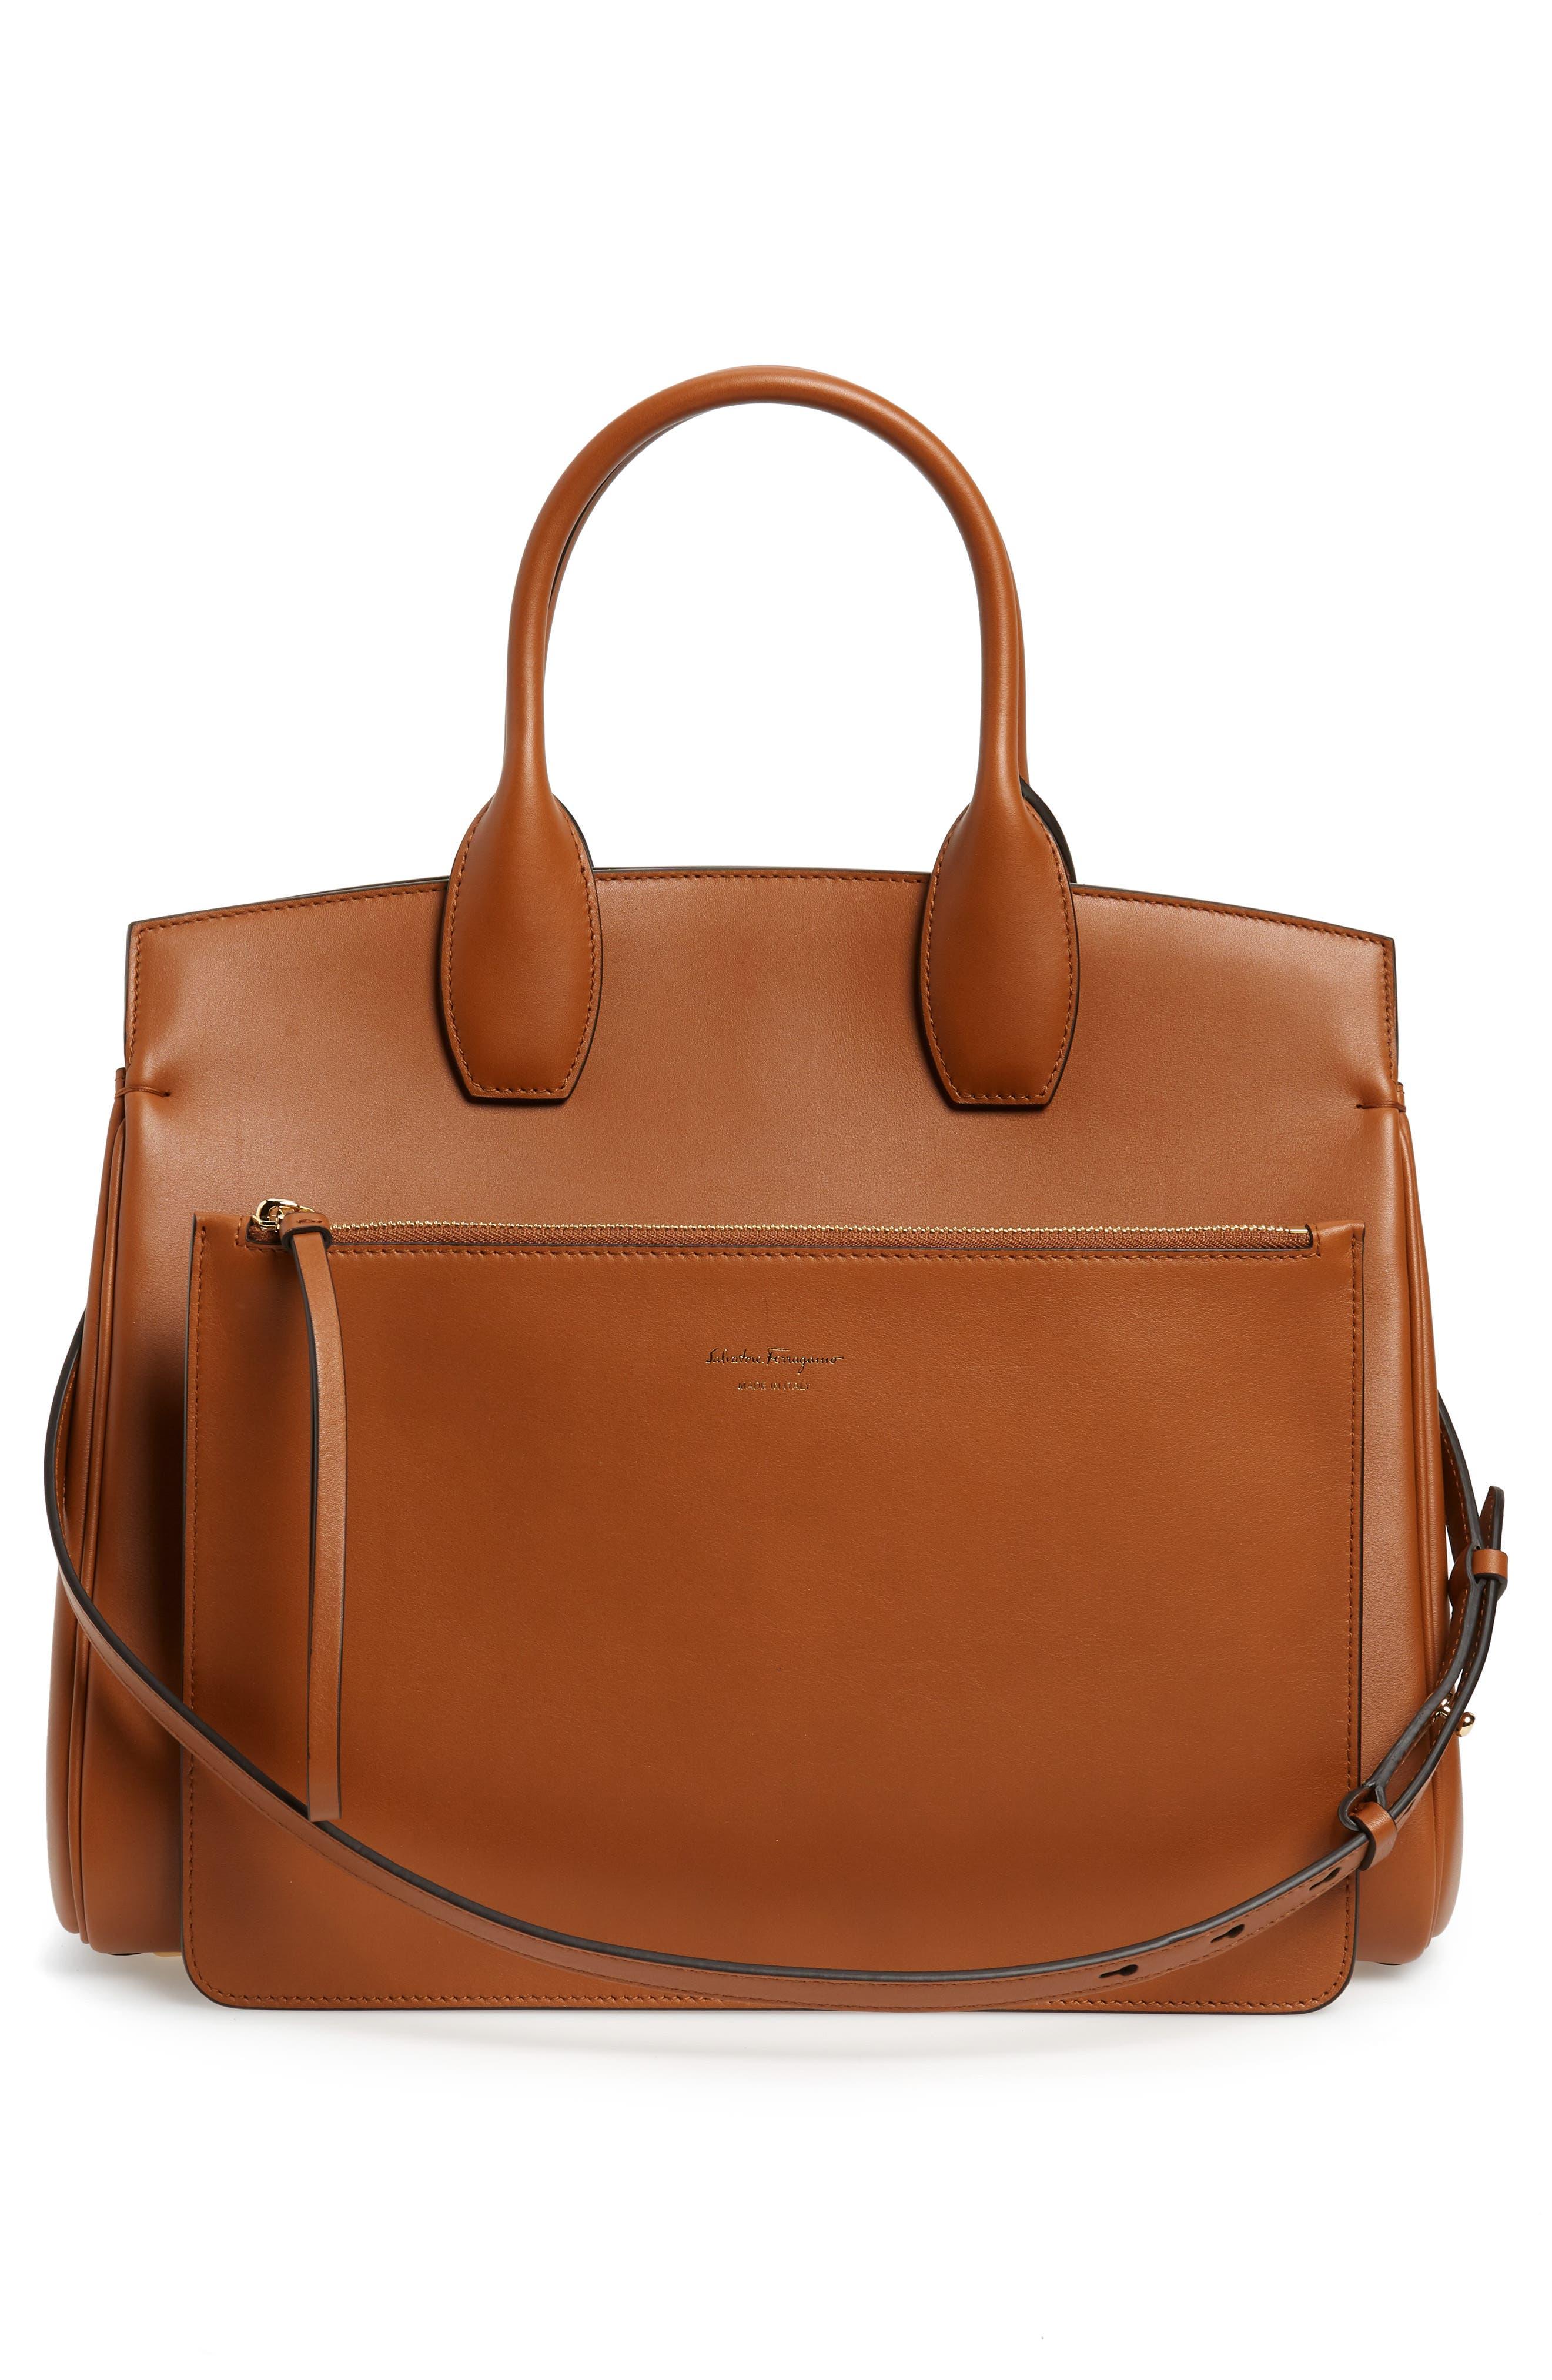 SALVATORE FERRAGAMO, Medium The Studio Calfskin Leather Top Handle Bag, Alternate thumbnail 3, color, SELLA